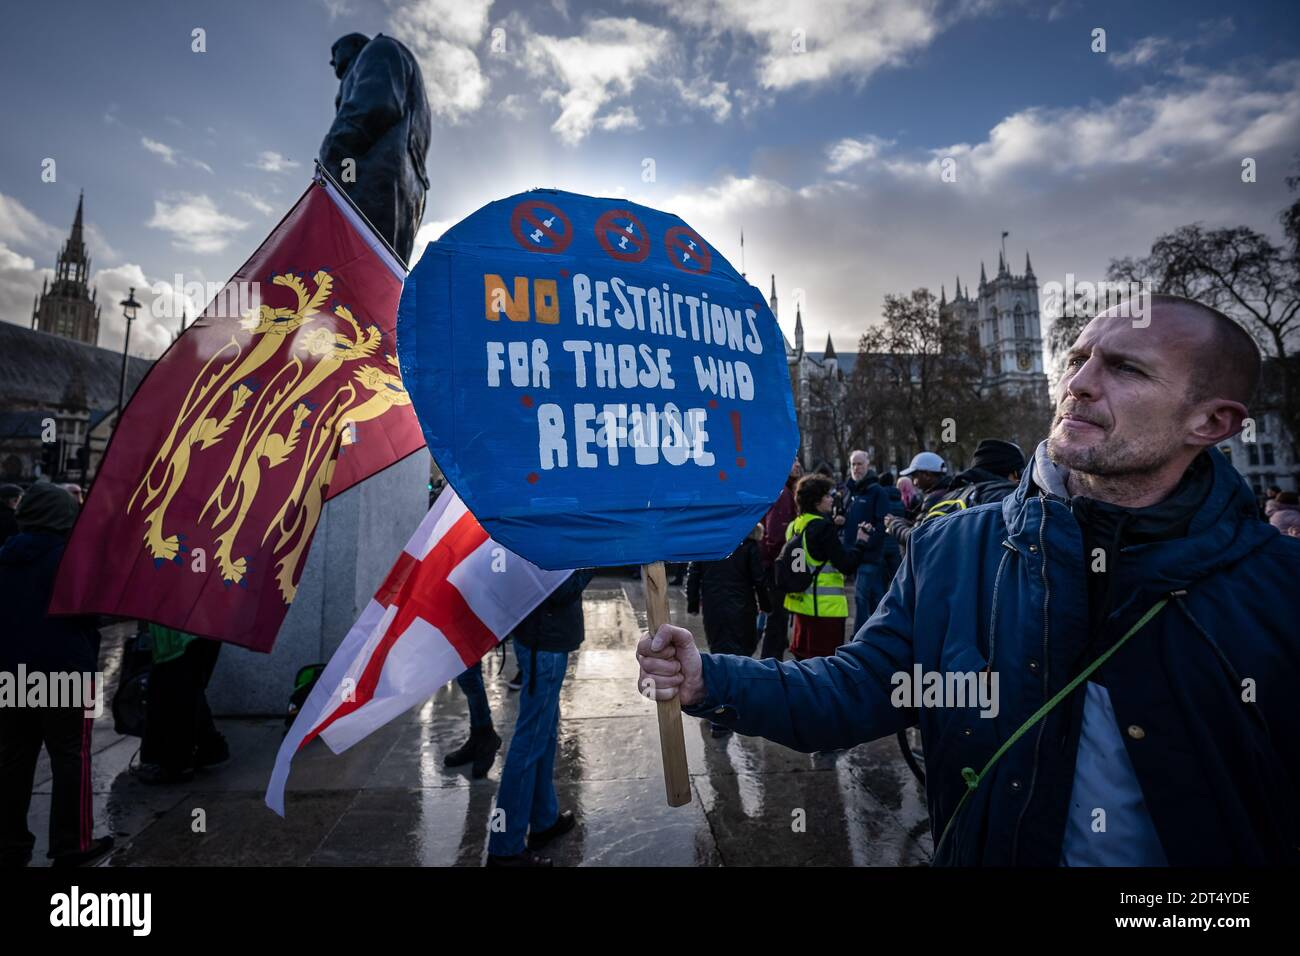 Coronavirus: Anti-Vaxxer-Demonstration auf dem Parliament Square, London, Großbritannien. Stockfoto